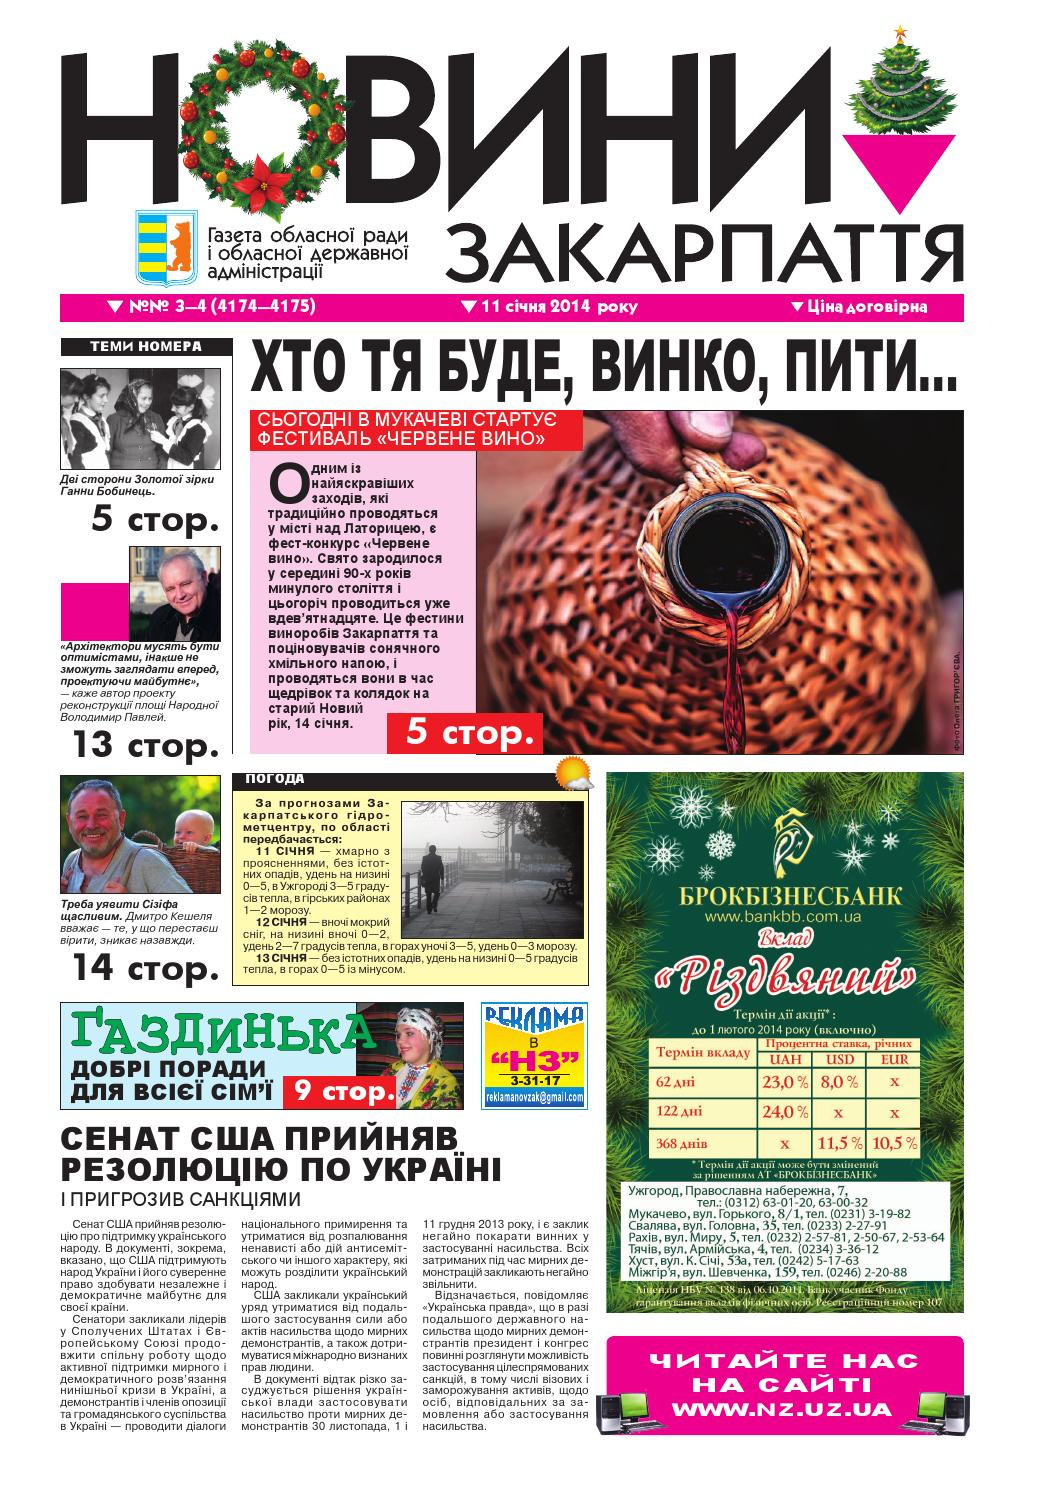 Novini 11 01 2014 №№ 3-4 (4174-4175) by Новини Закарпаття - issuu 190b4ebb68ab4